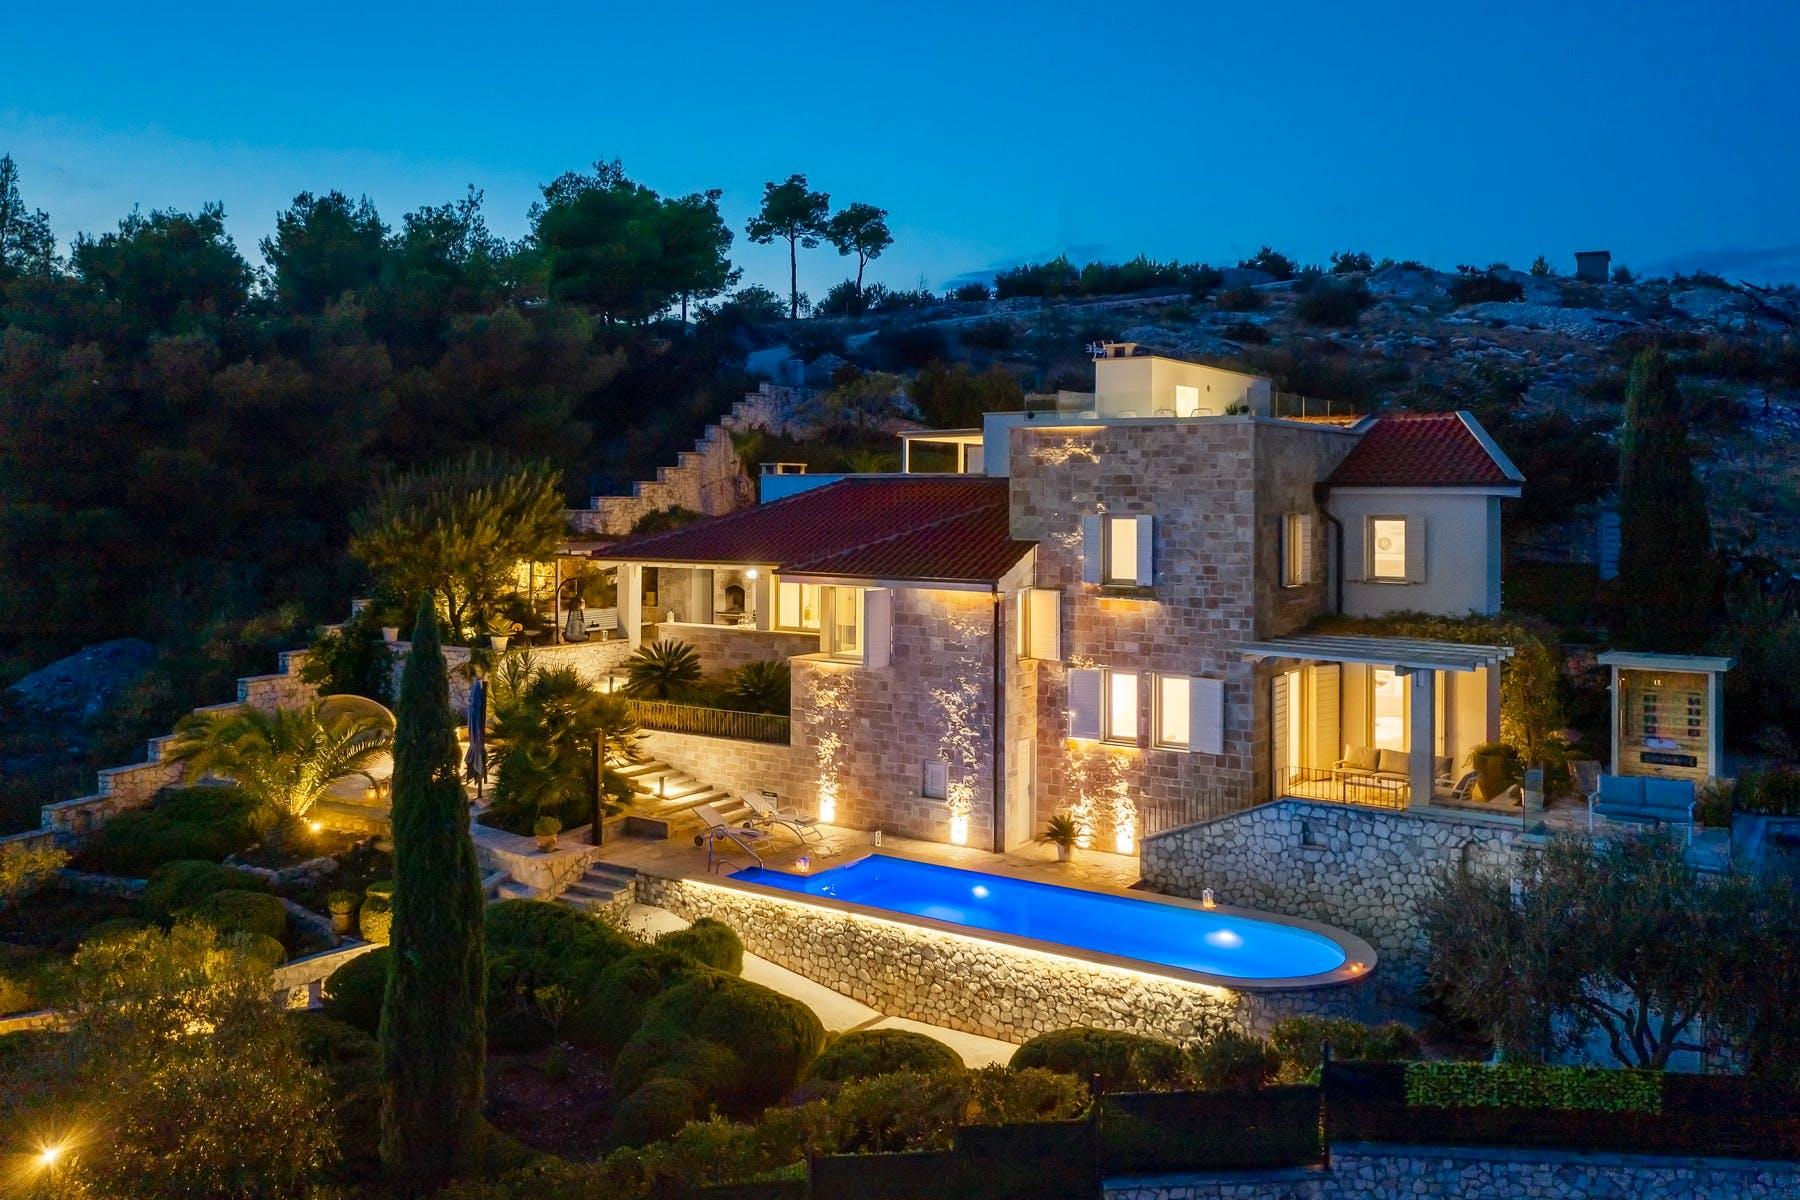 Night atmosphere of luxury villa